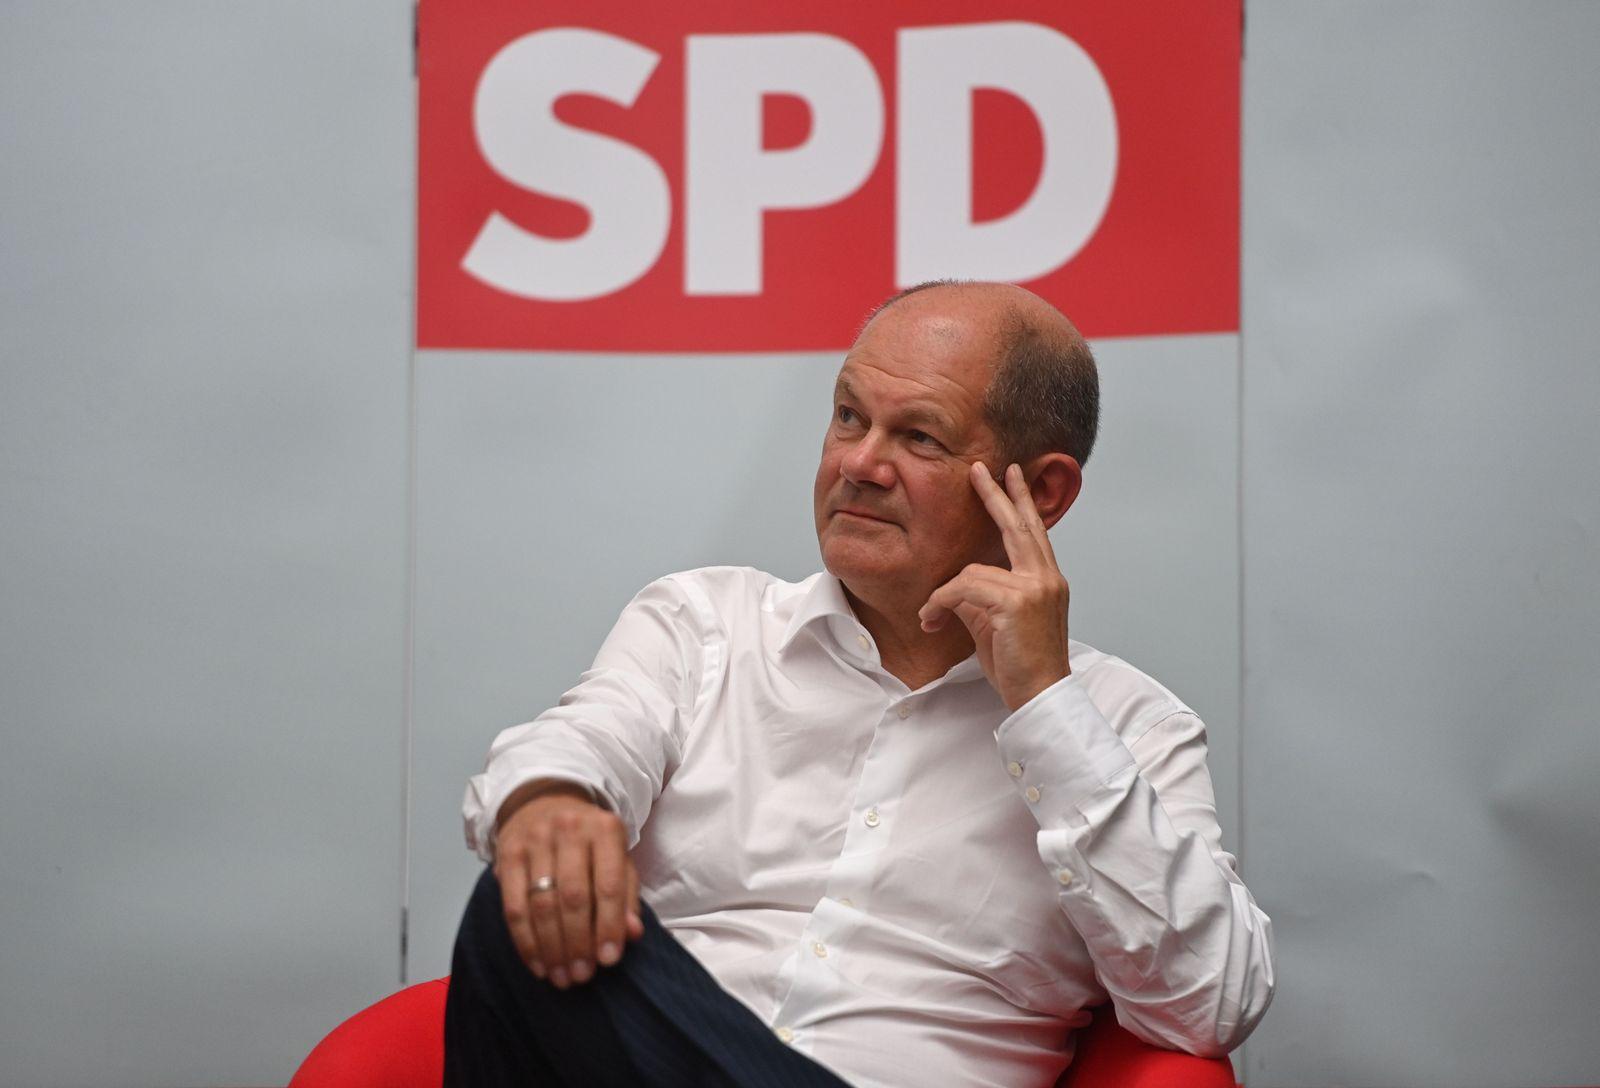 GERMANY-POLITICS-SPD-SCHOLZ